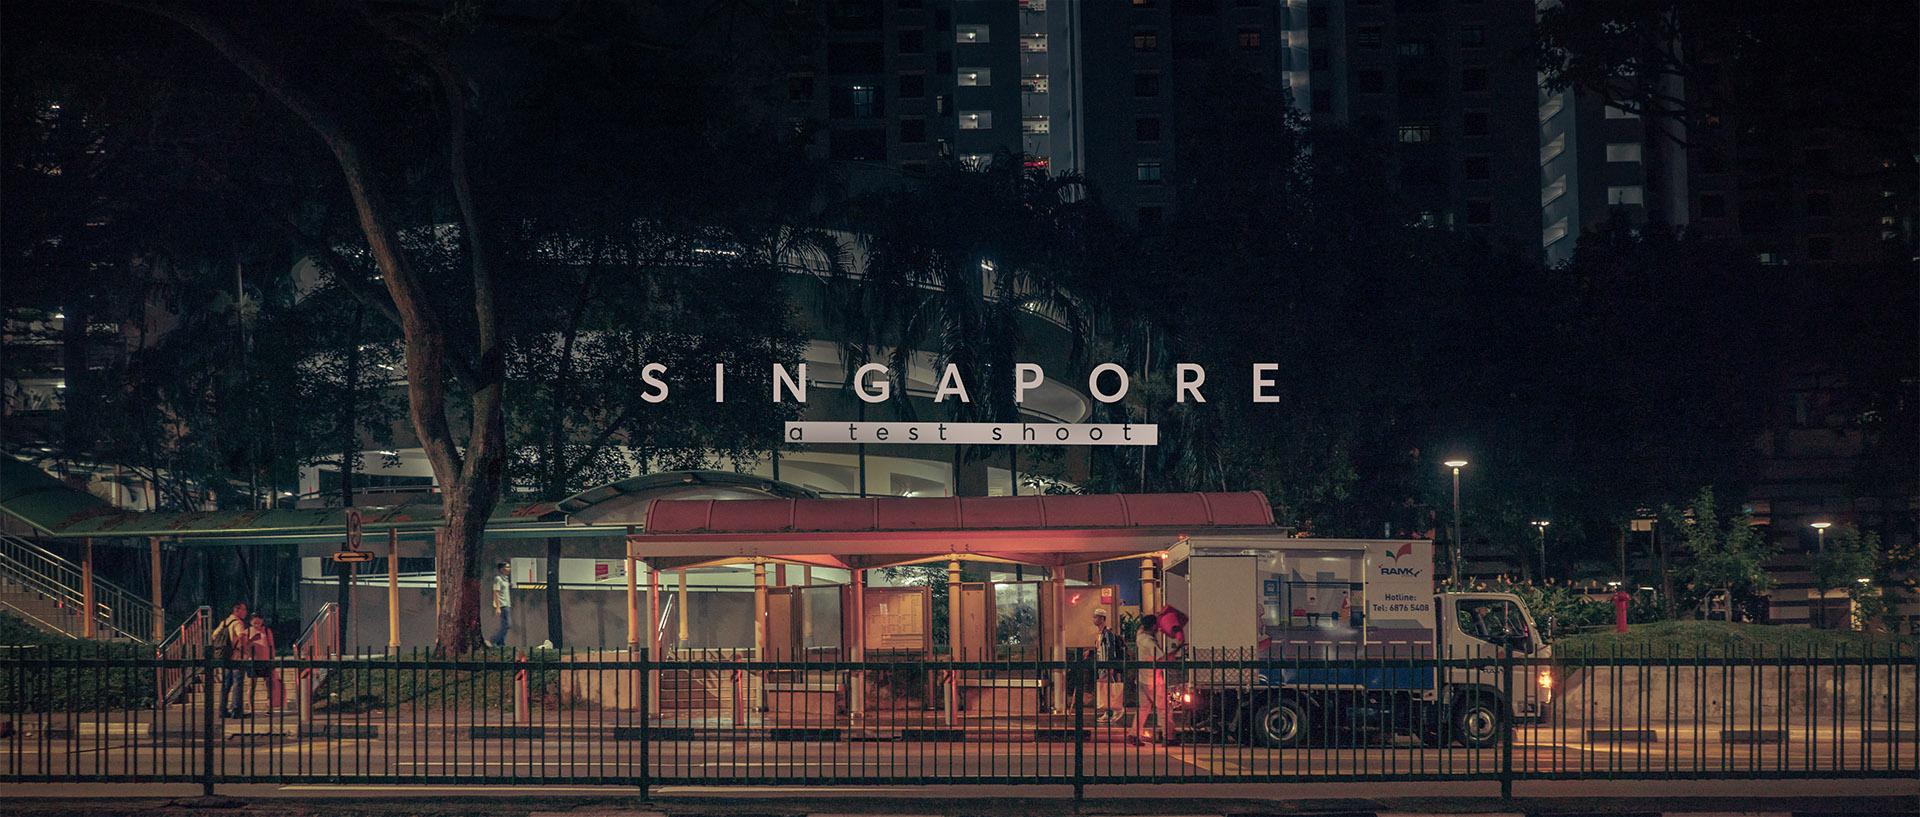 Nikko Pascua Travel photography Singapore_09218-cover.jpg